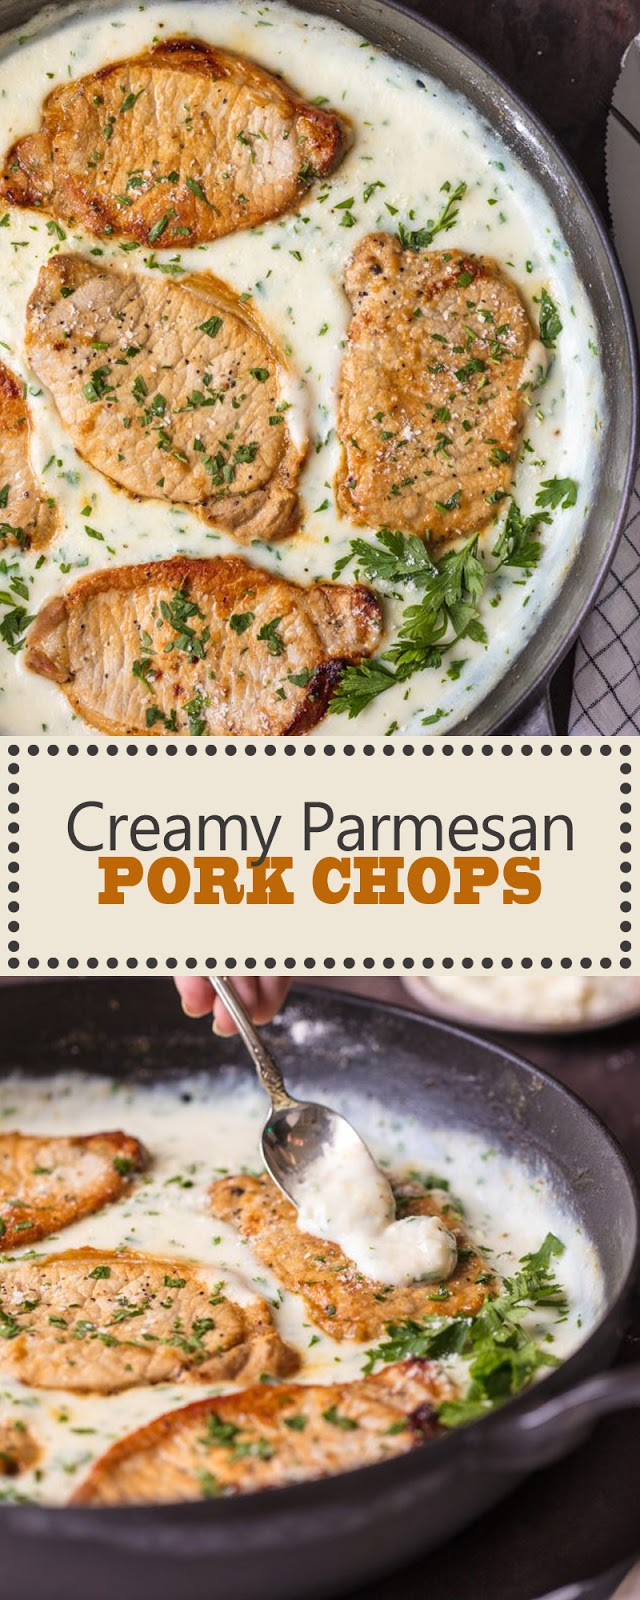 CREAMY PARMESAN PORK CHOPS